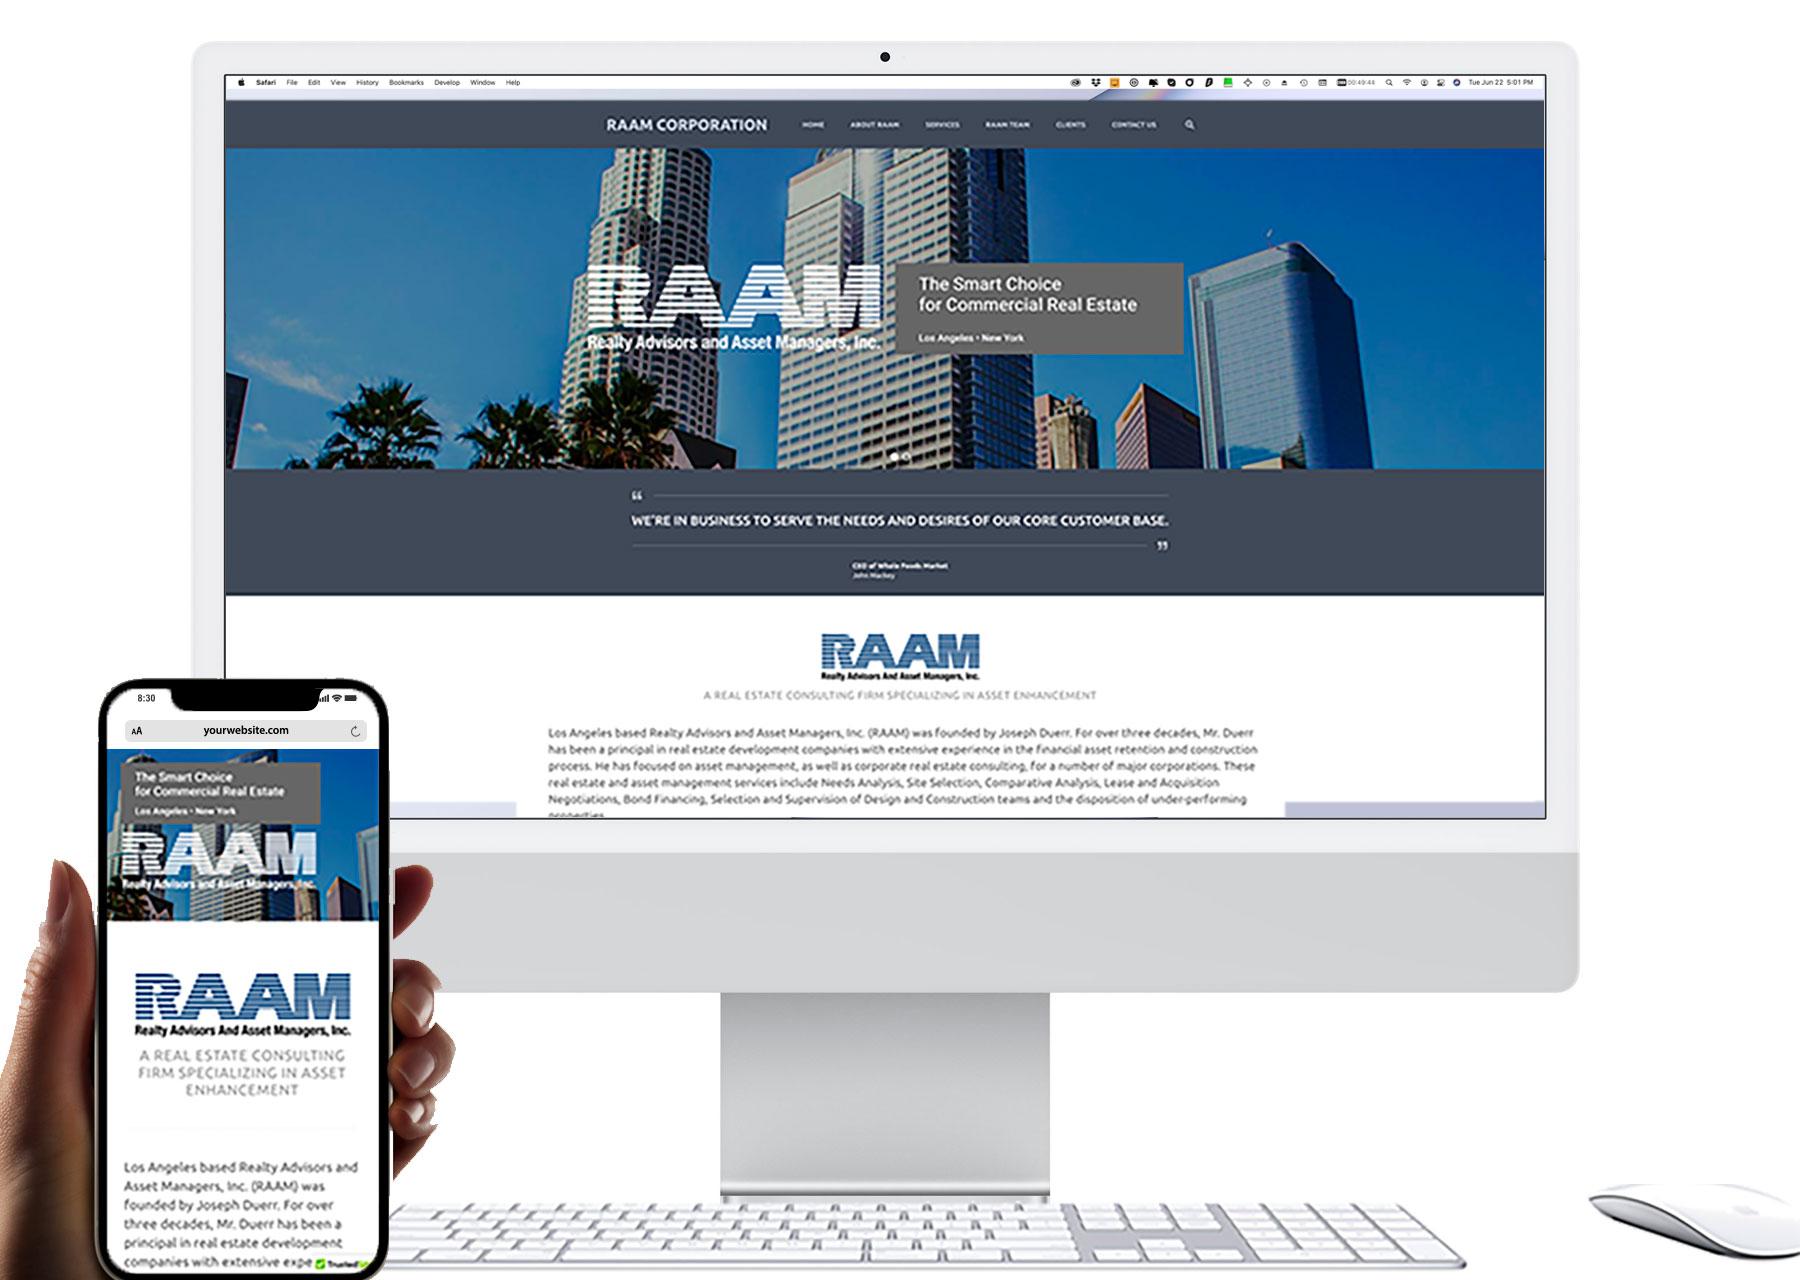 Marketing by Design | Portfolio: RAAM Corporation Website